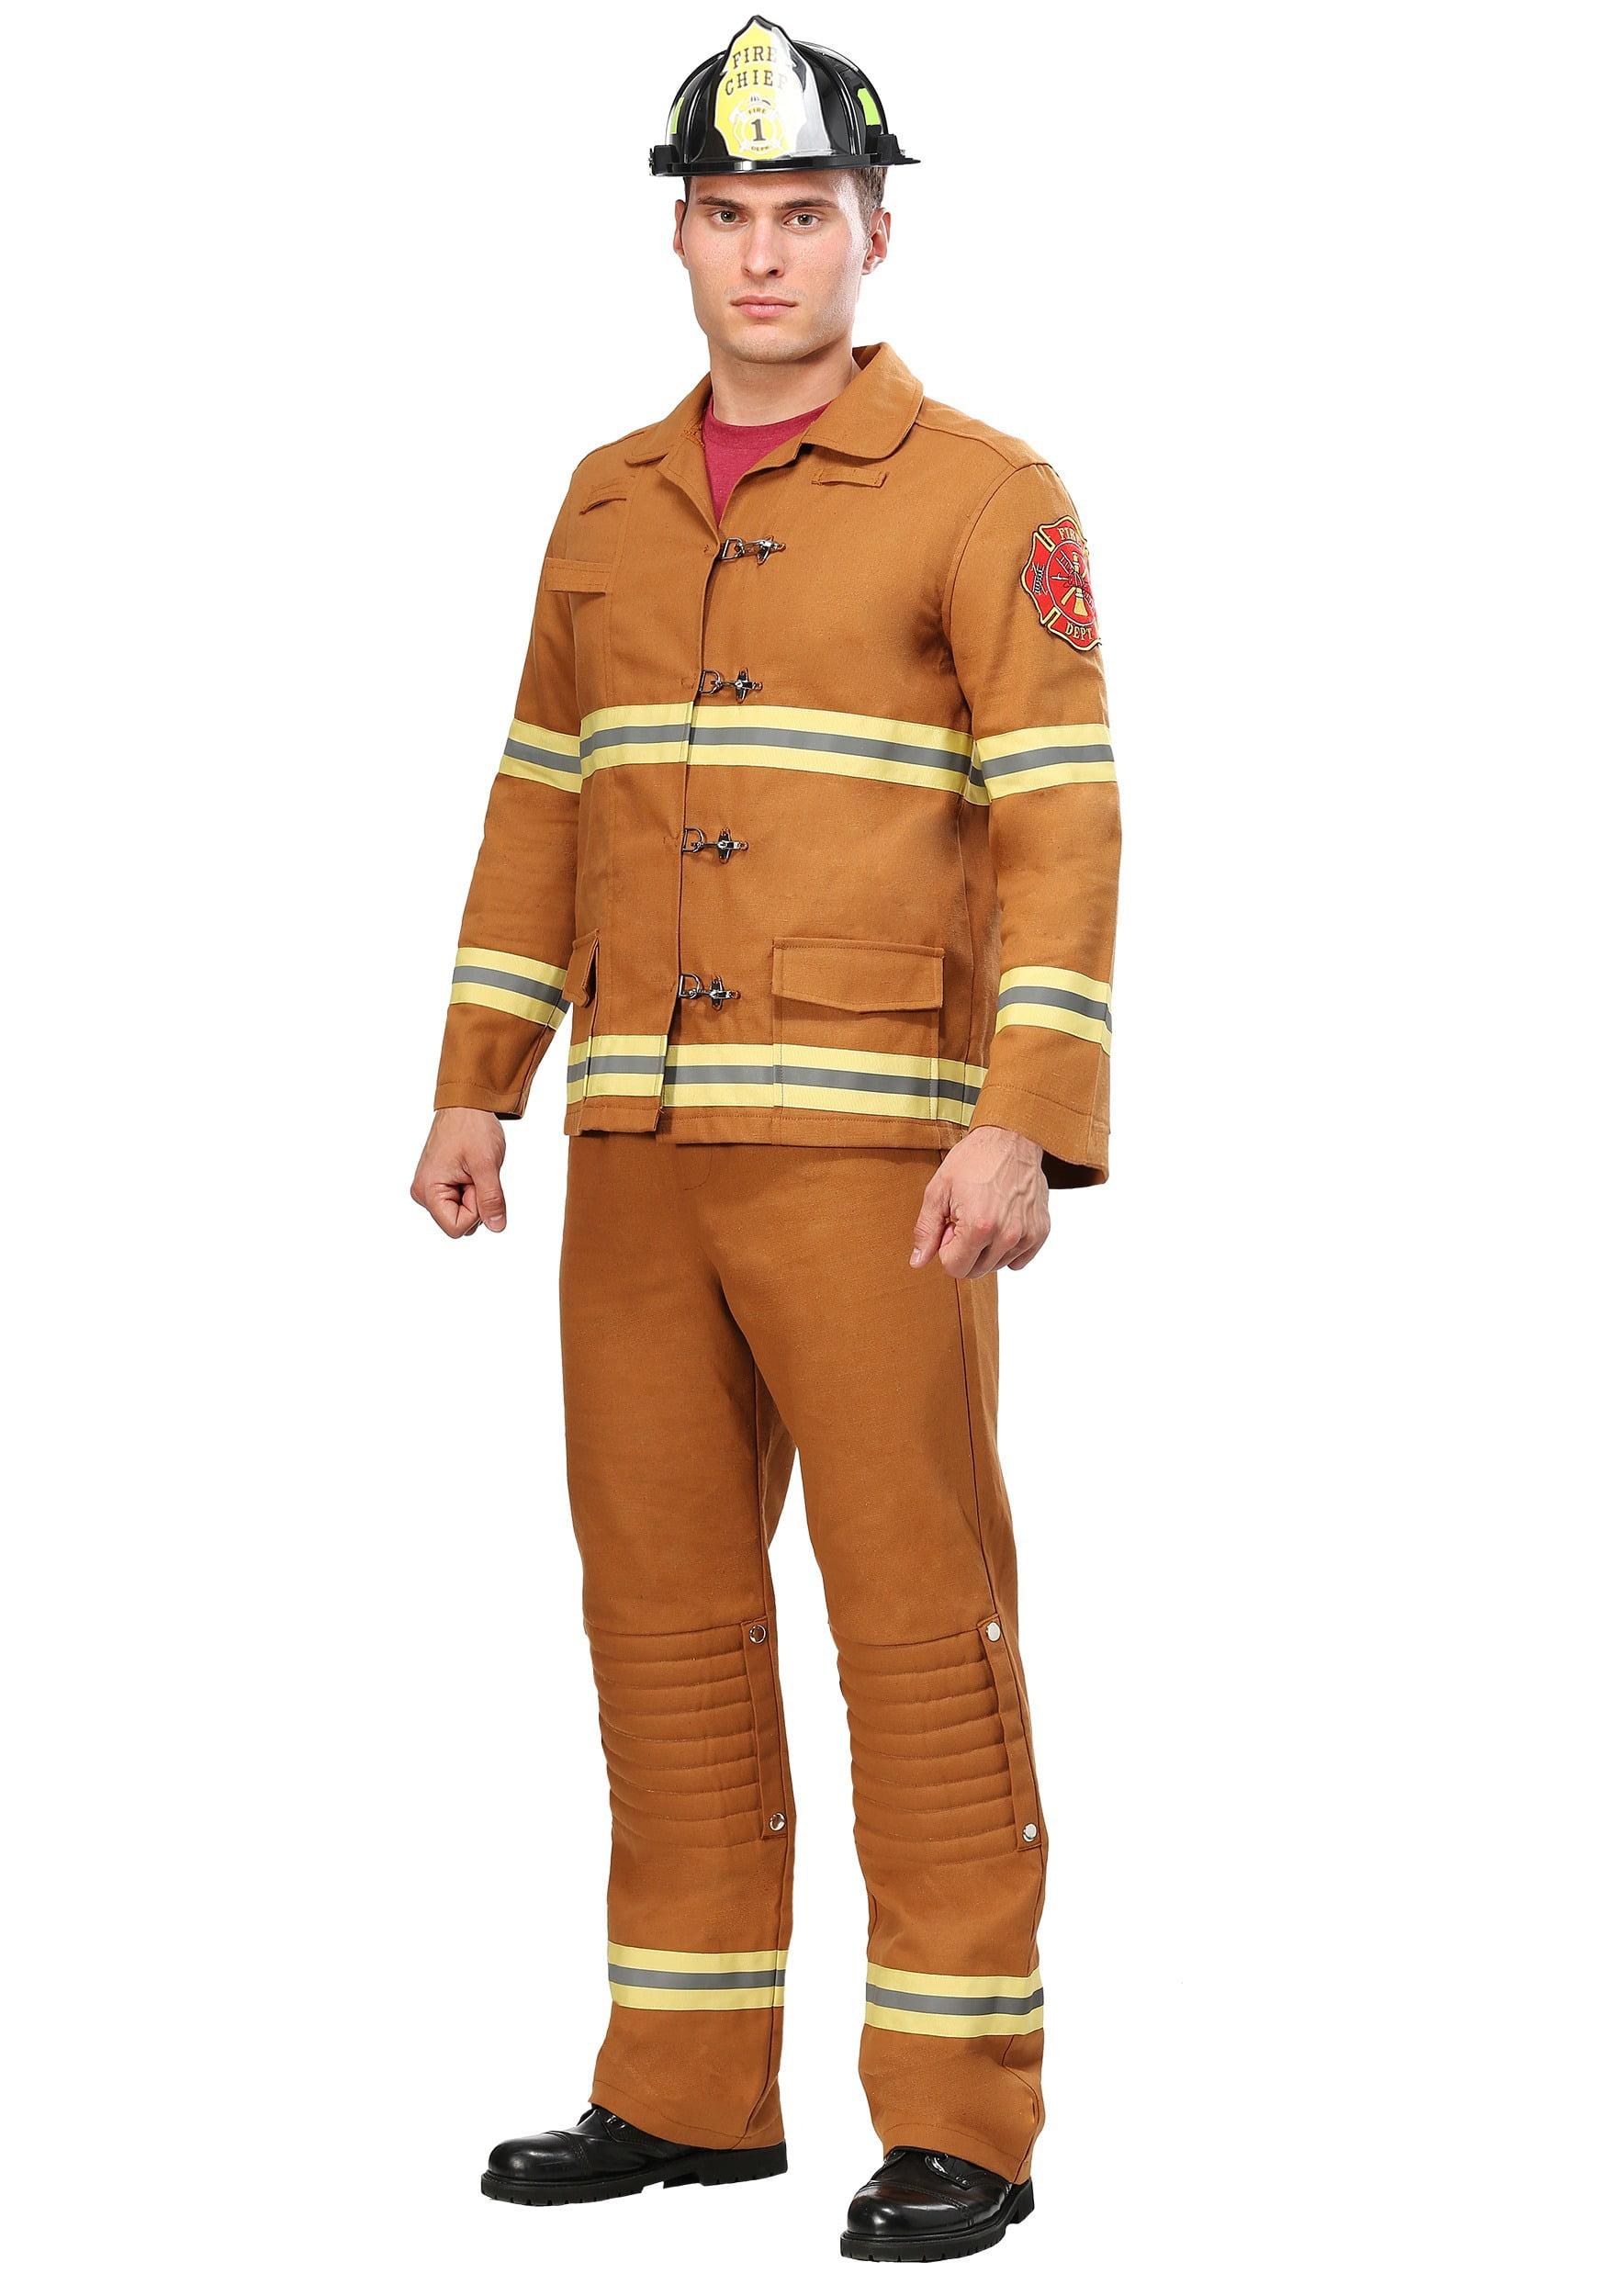 NEW Girls Fire Chief Small 4-6 Firefighter Glitter Costume